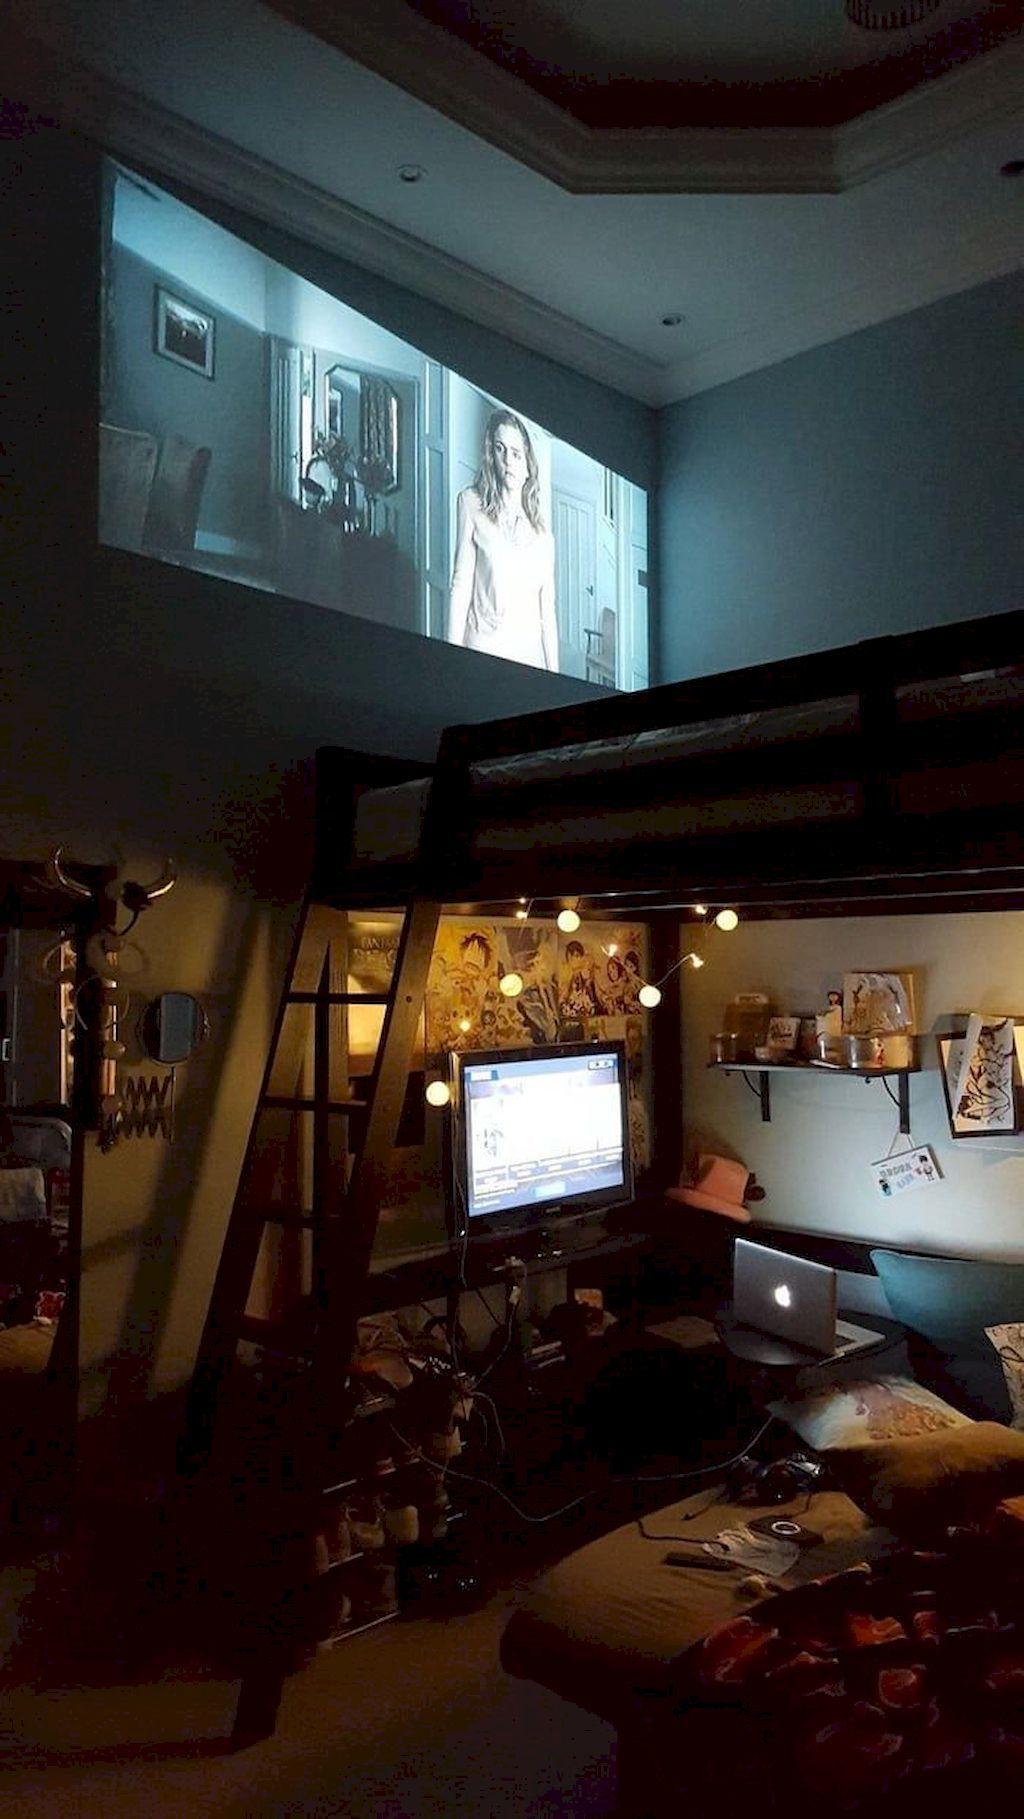 70 Genius Dorm Room Decorating Ideas on A Budget images